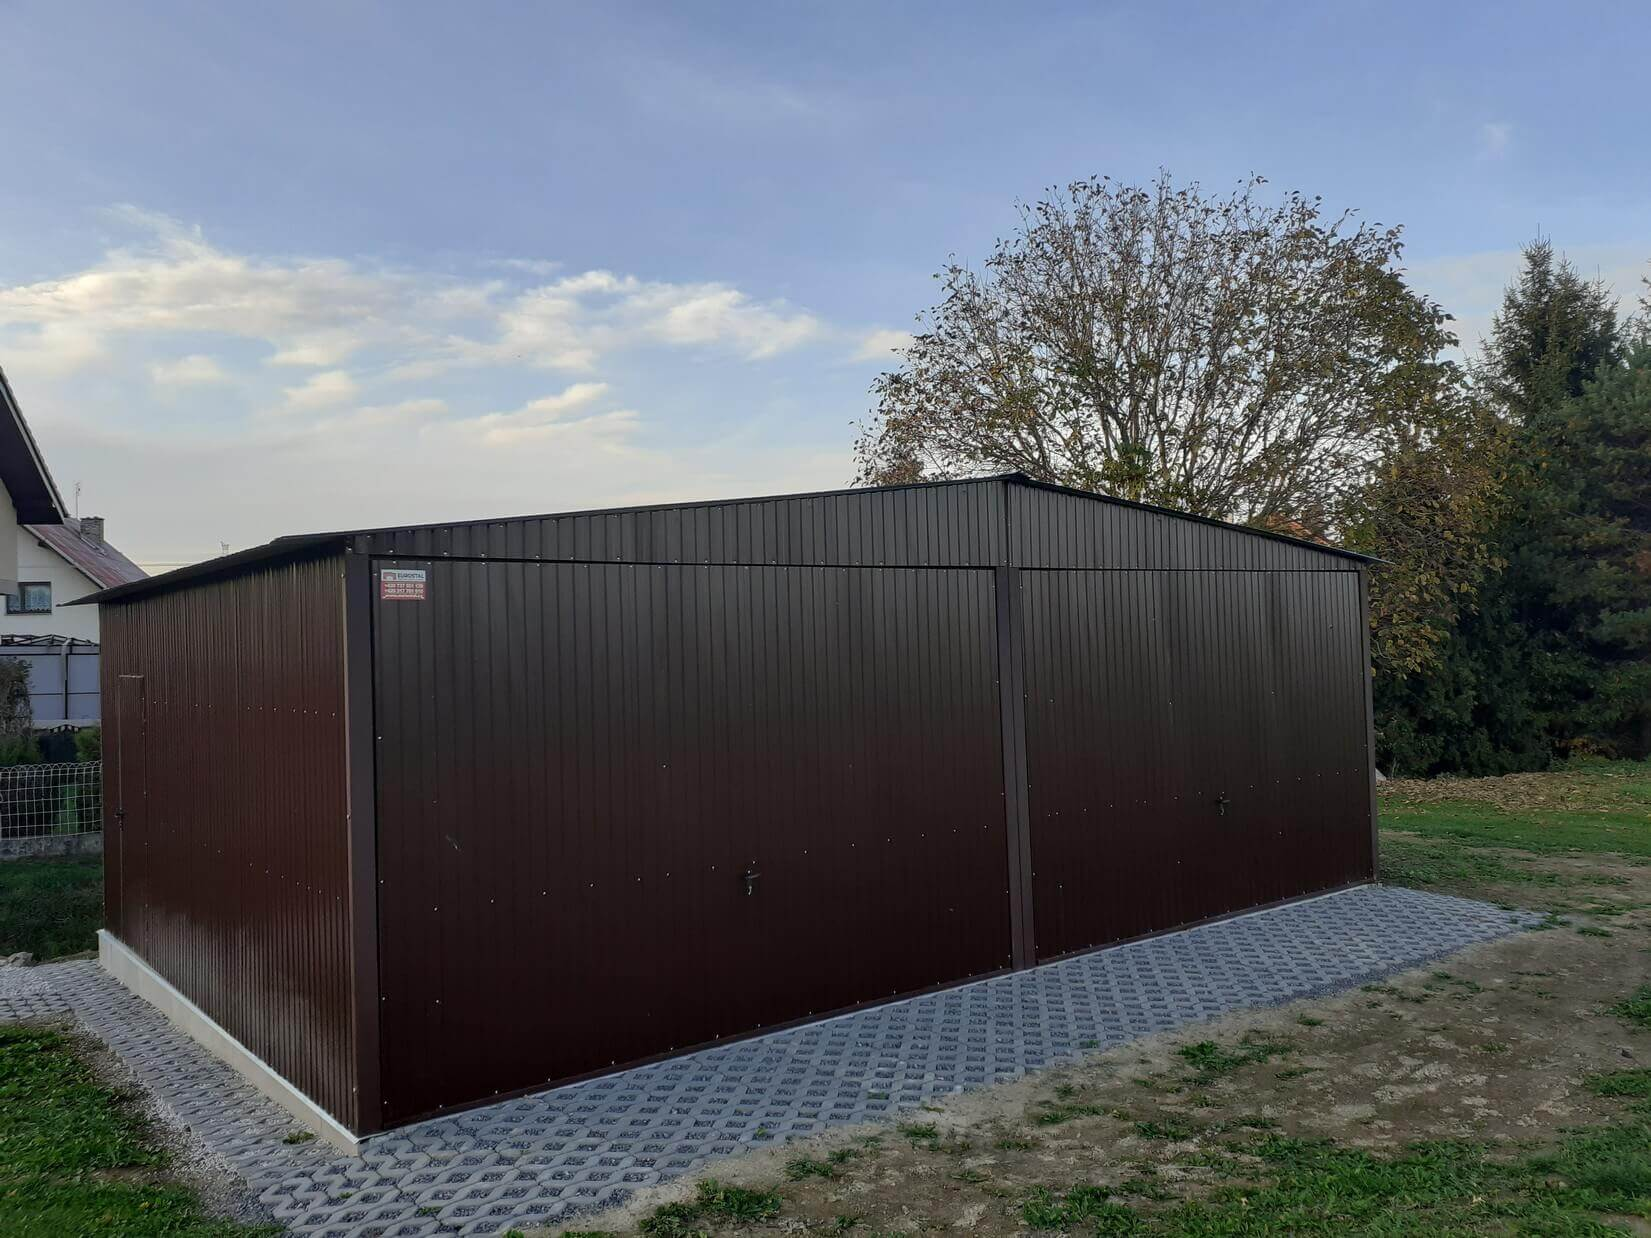 Plechová garáž 7x5 sedlová strecha RAL8017